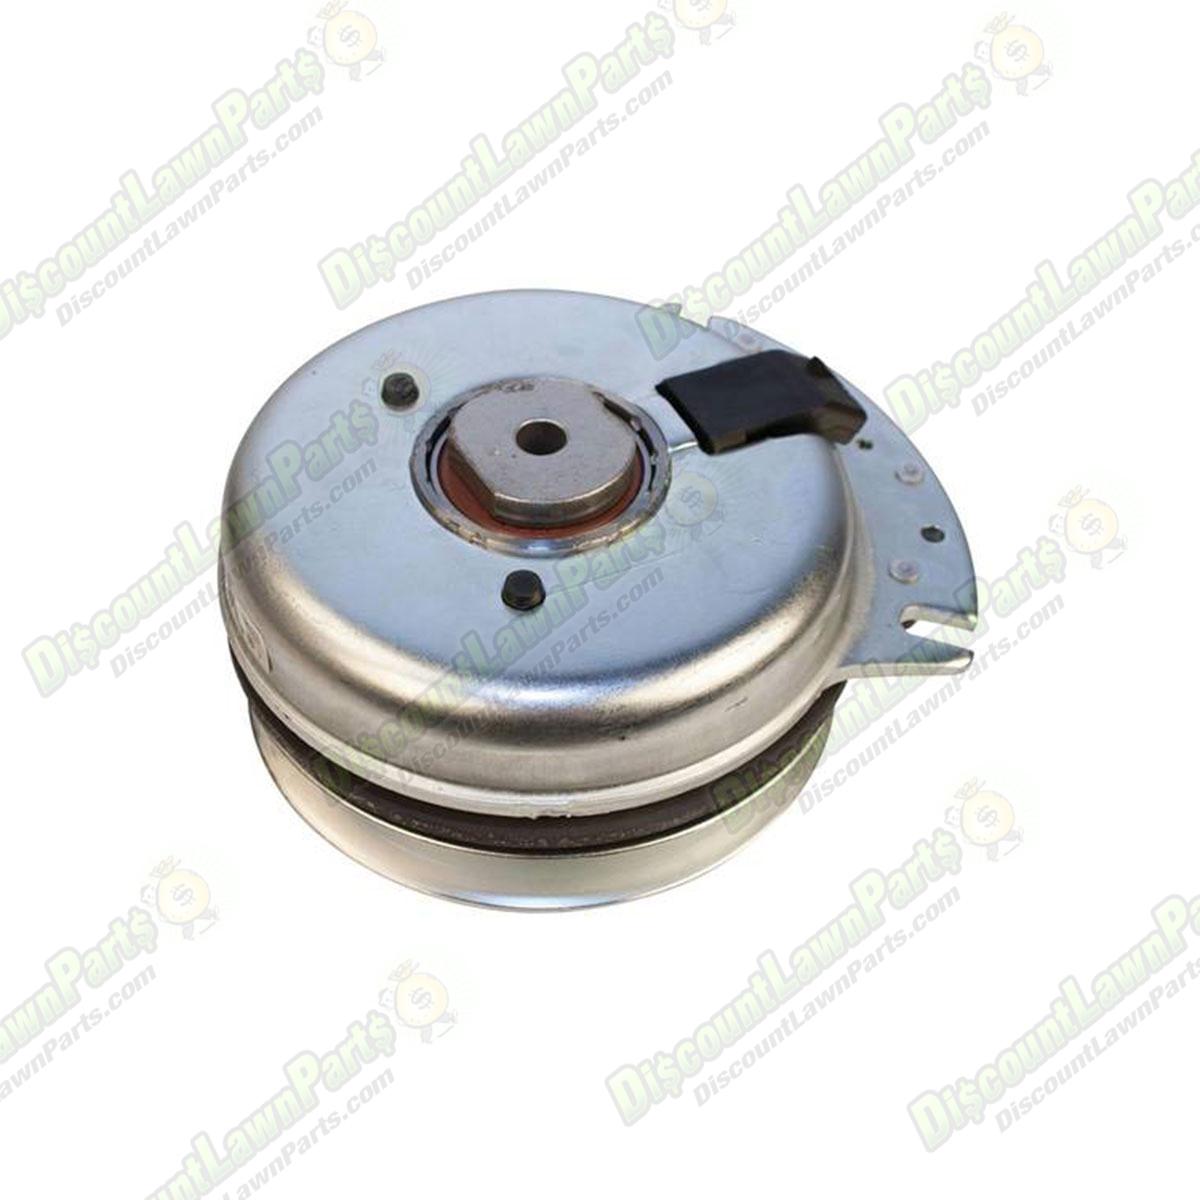 Electric PTO Clutch / Warner 5218-259